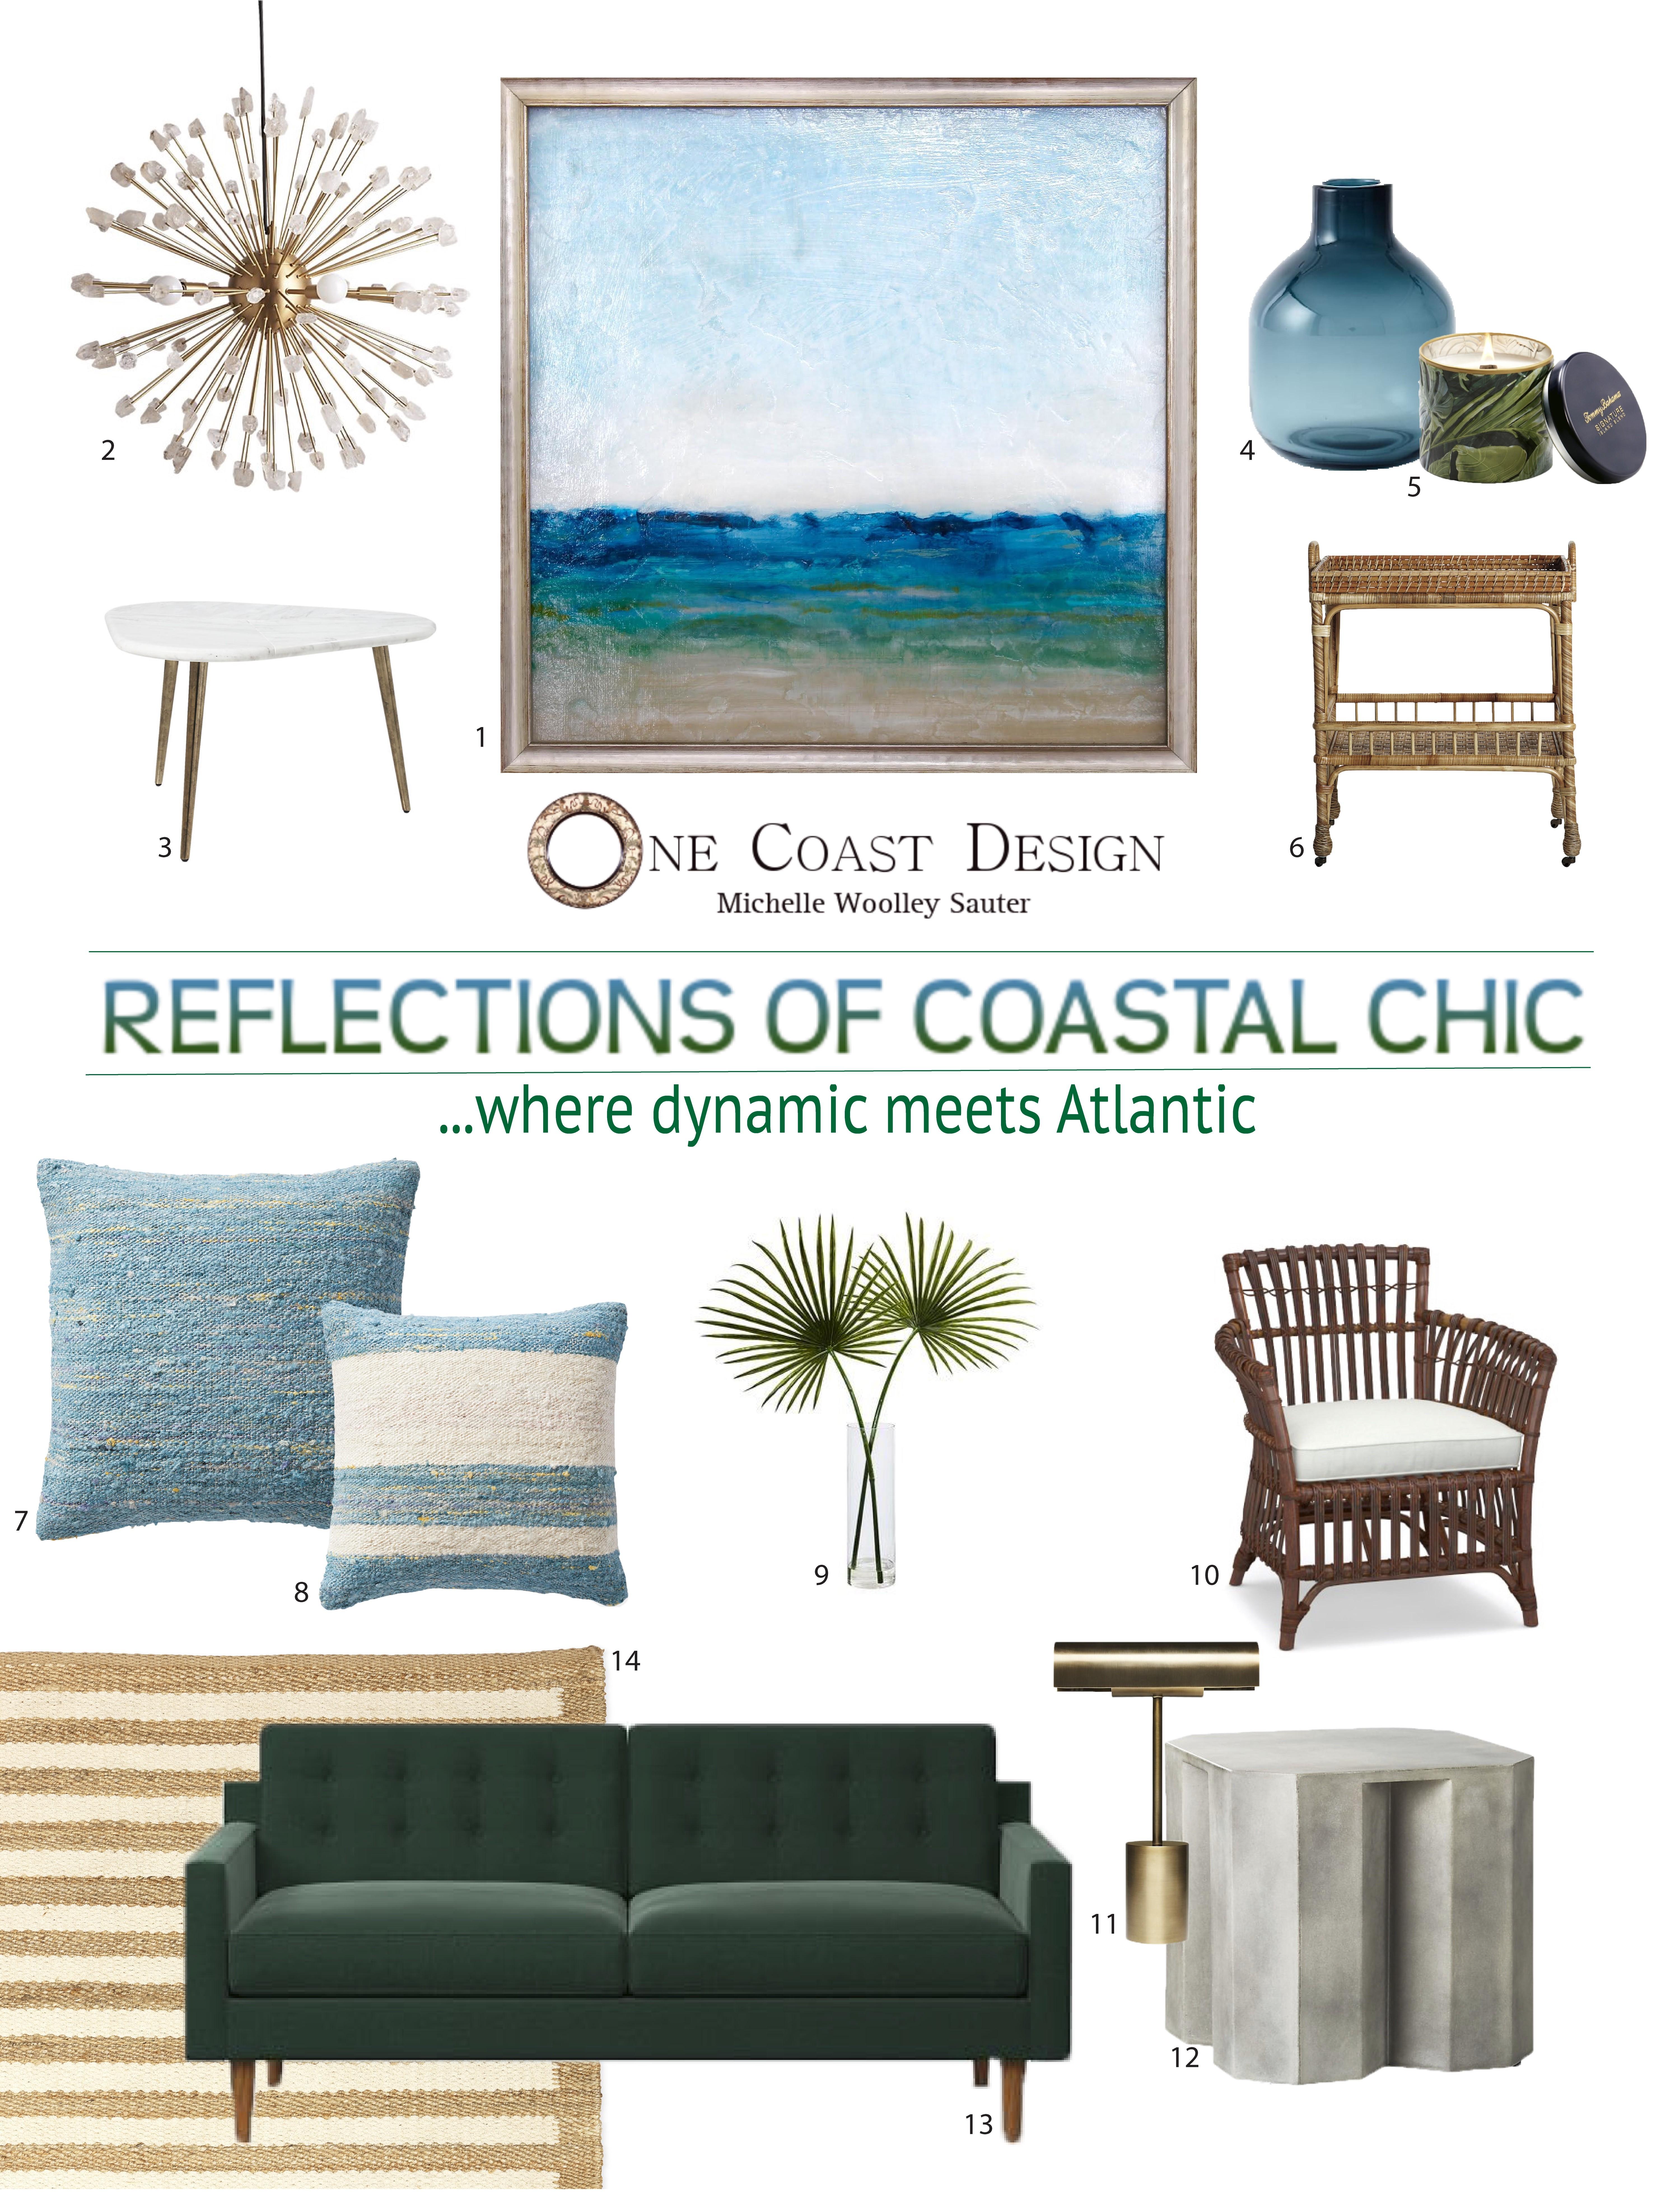 Reflections of Coastal Chic